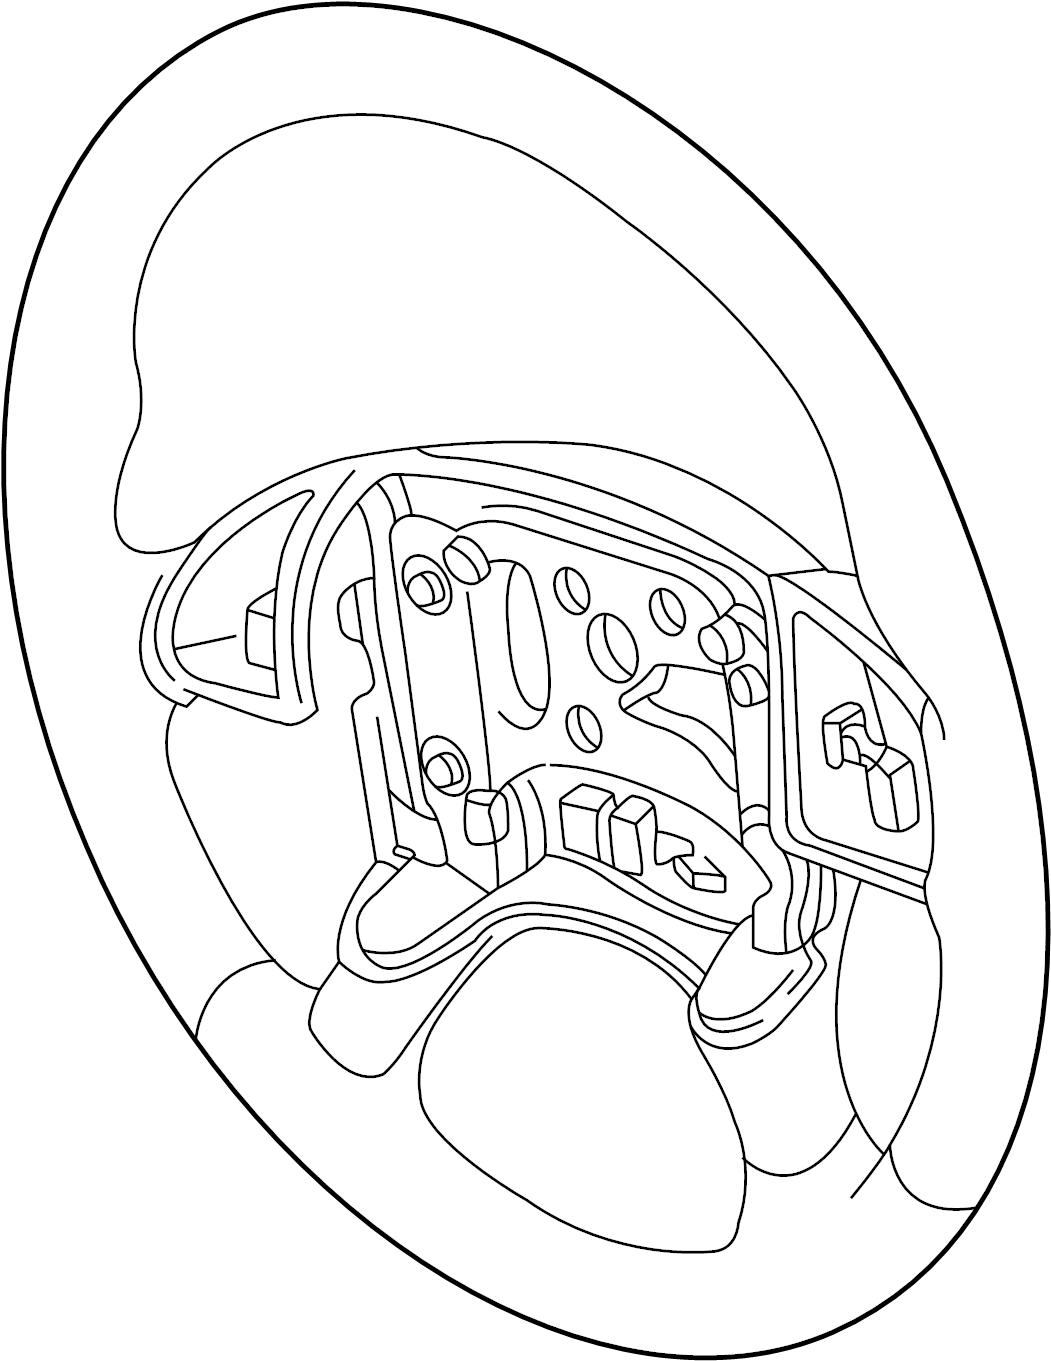 Pontiac Montana Steering Wheel  Trans Sport  Montana  Leather  W  Leather